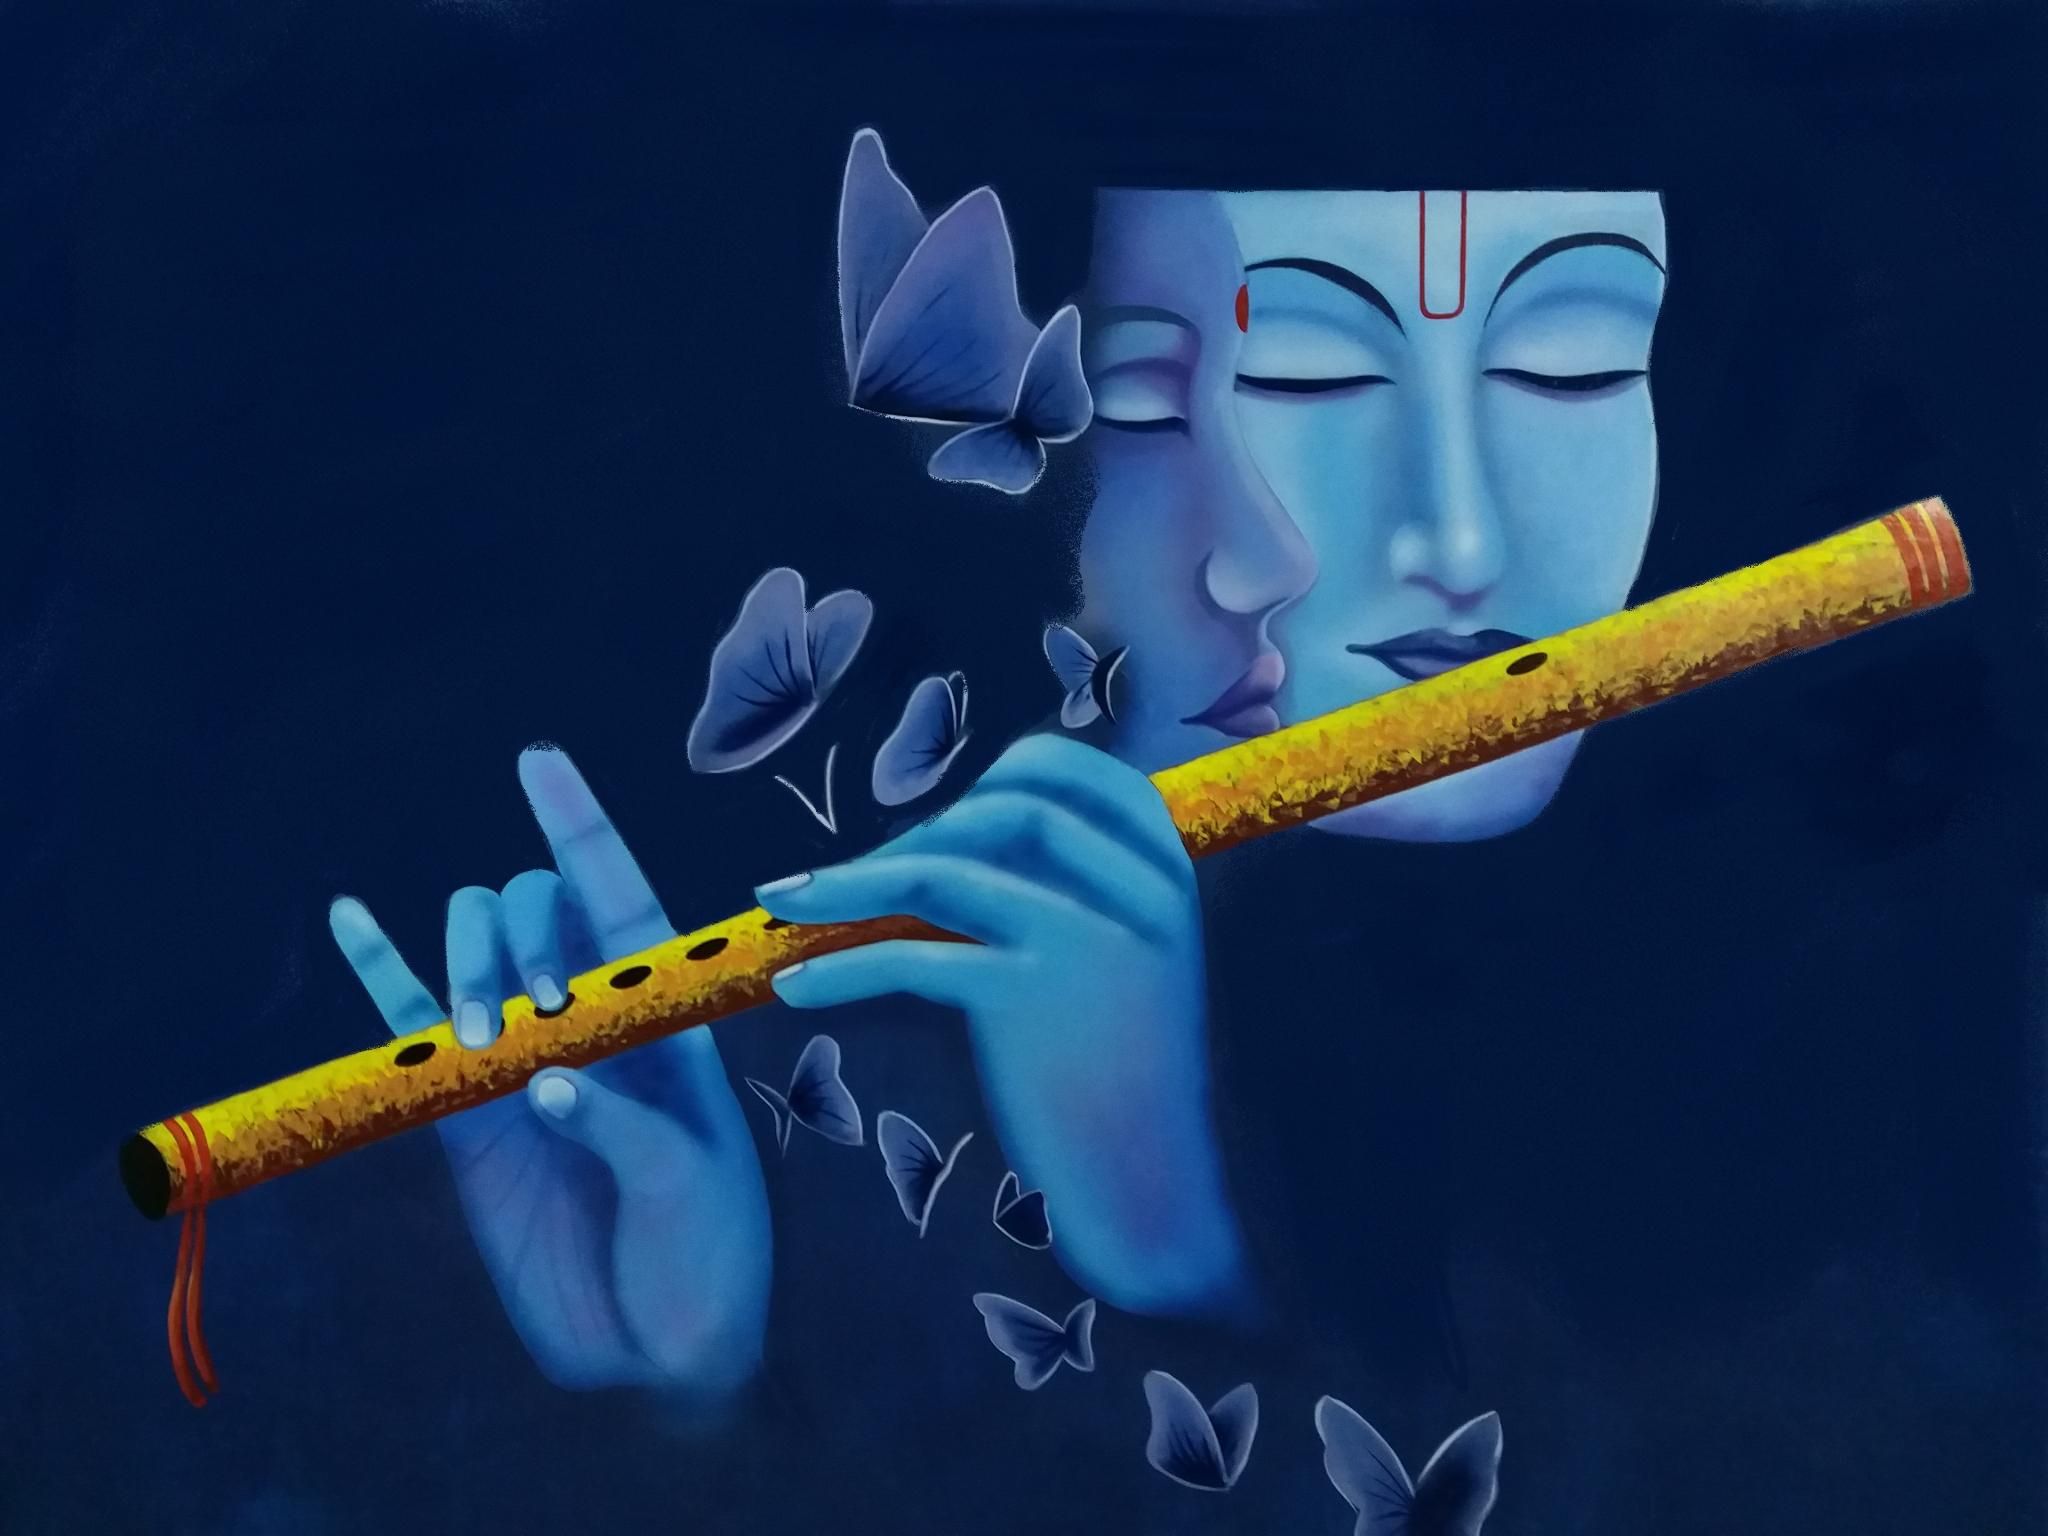 Pencil sketching artists goregaon east mumbai